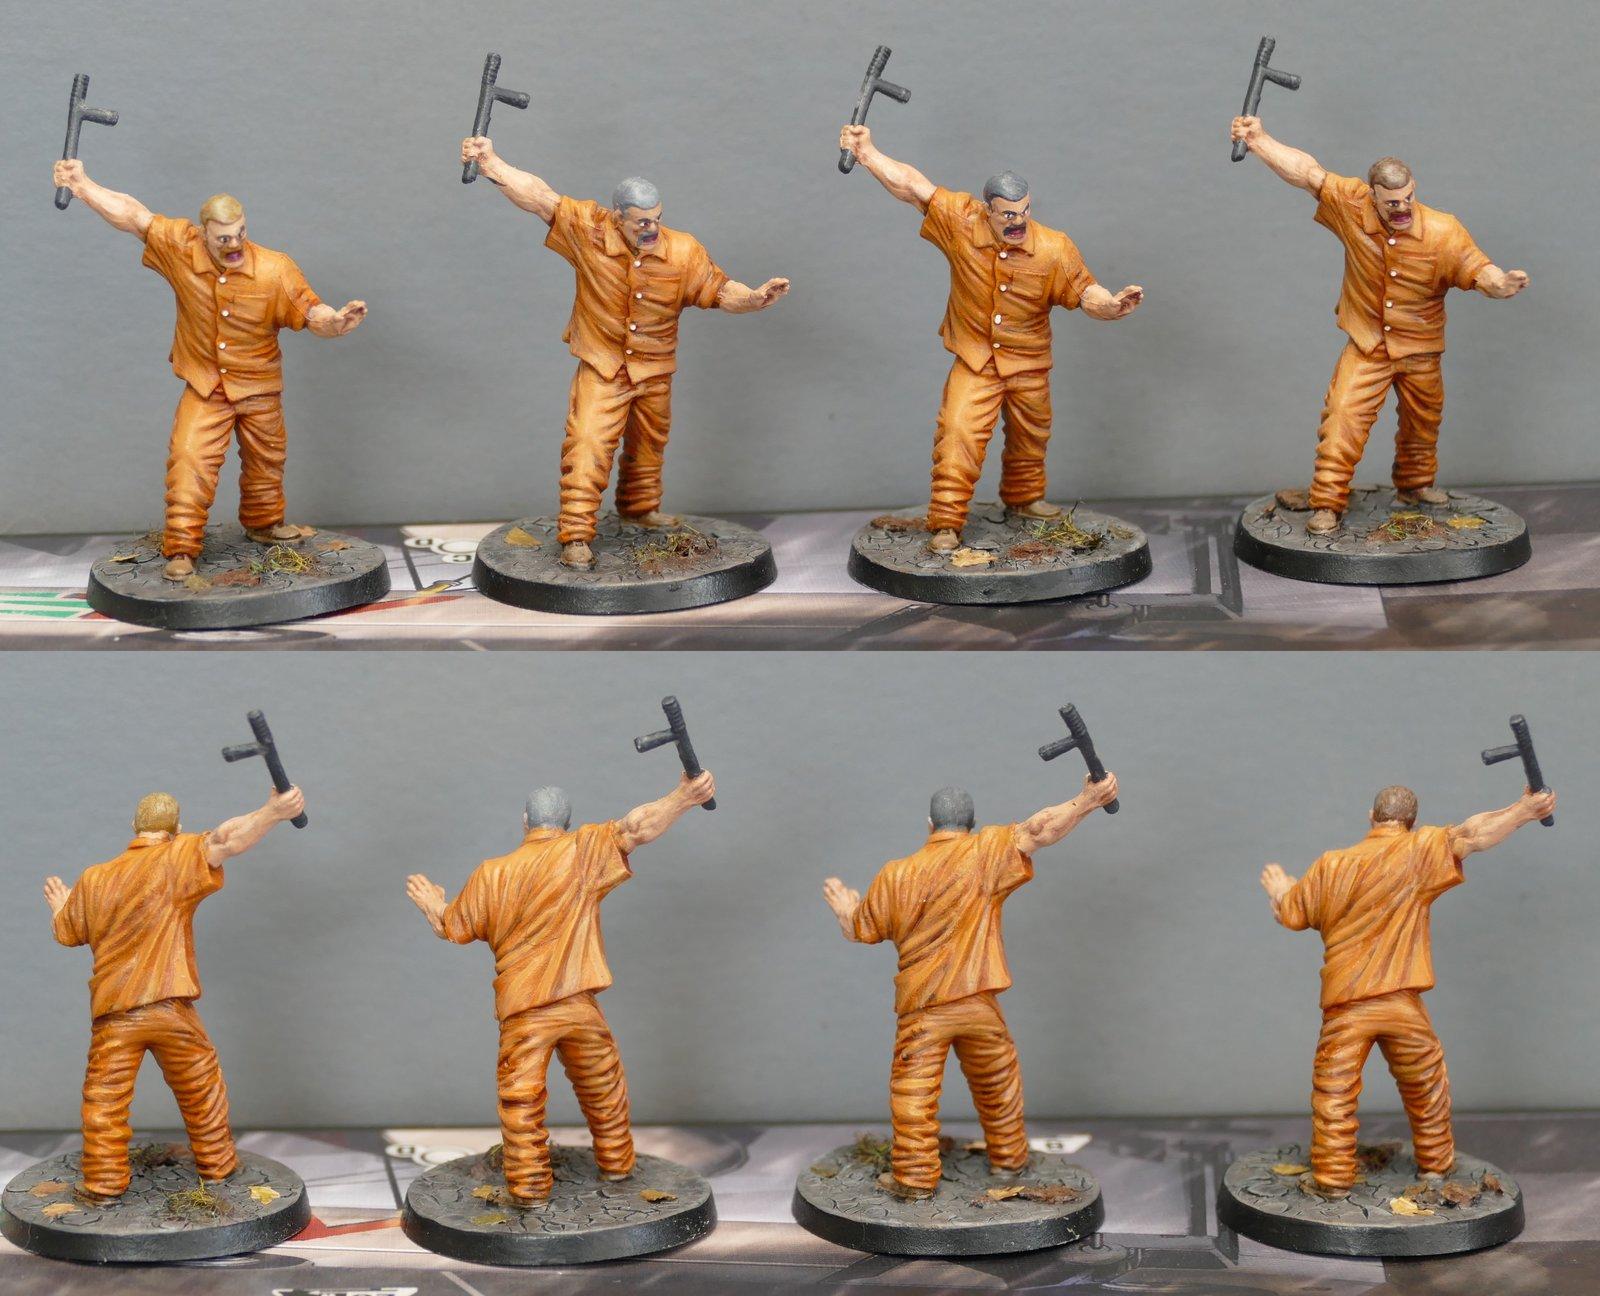 11_Prisoners_Low.jpg